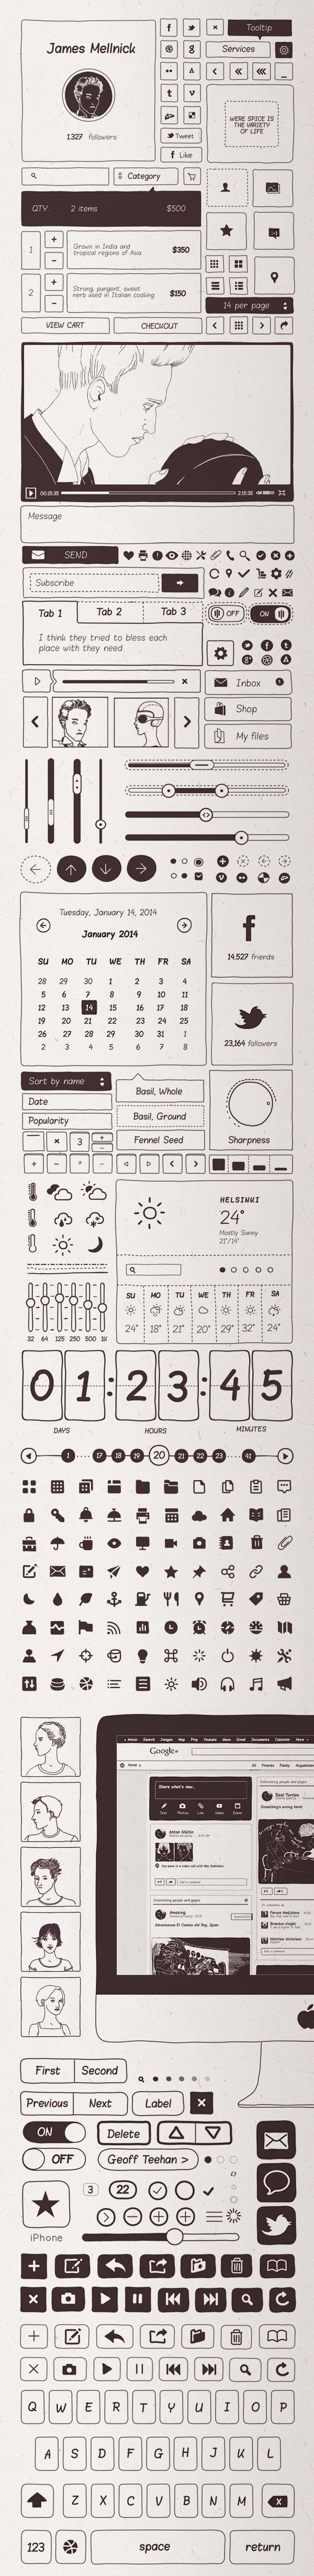 Basiliq-Freehand-UI-design-Kit